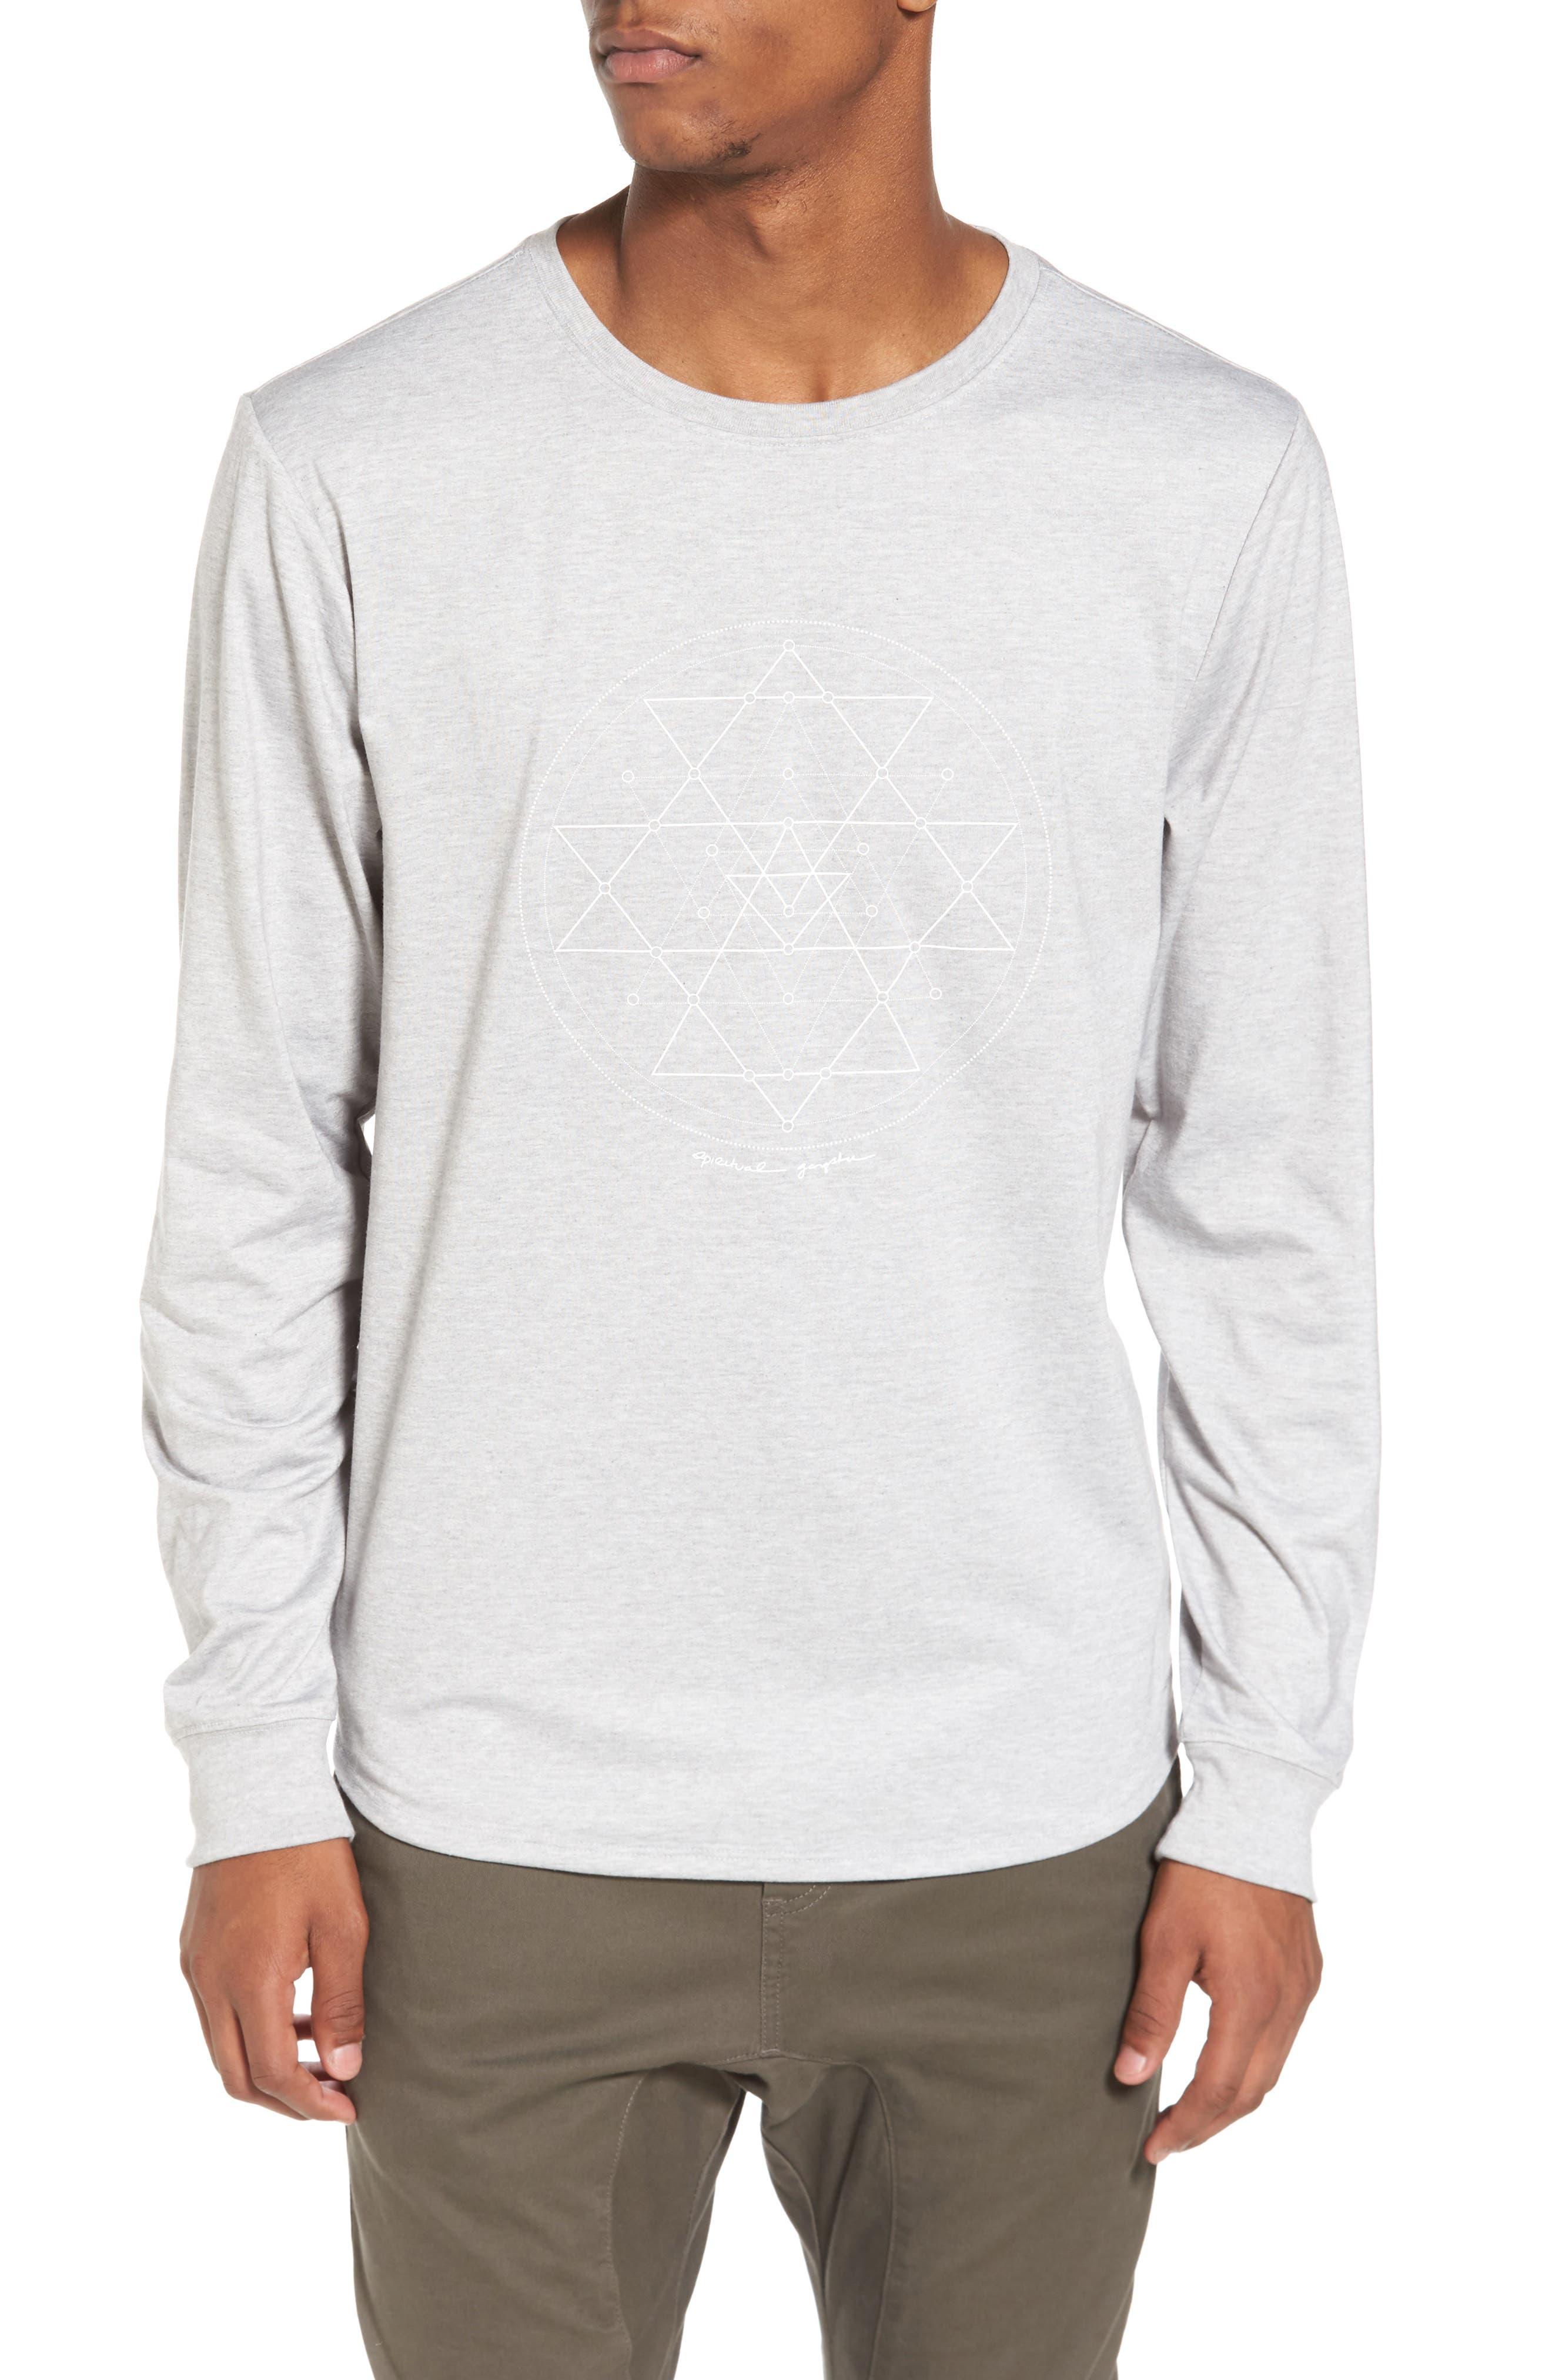 Yantra Long Sleeve T-Shirt,                         Main,                         color, Heather Grey/ Heather Grey